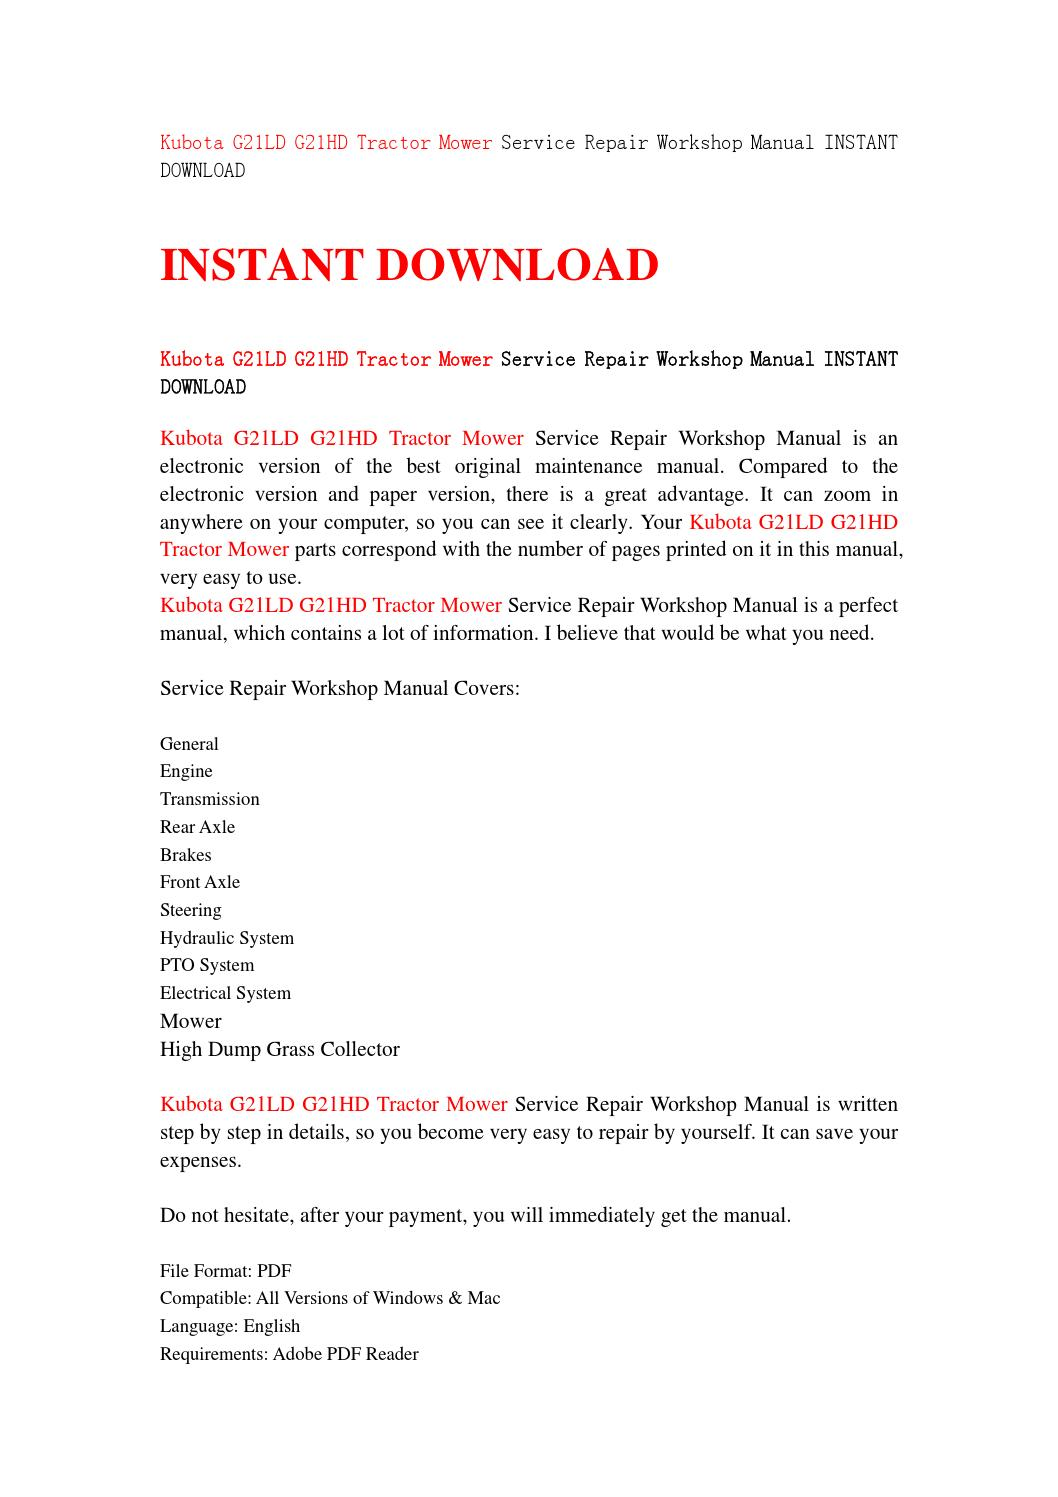 Kubota g21ld g21hd tractor mower service repair workshop manual instant  download by sjefhsnen - issuu